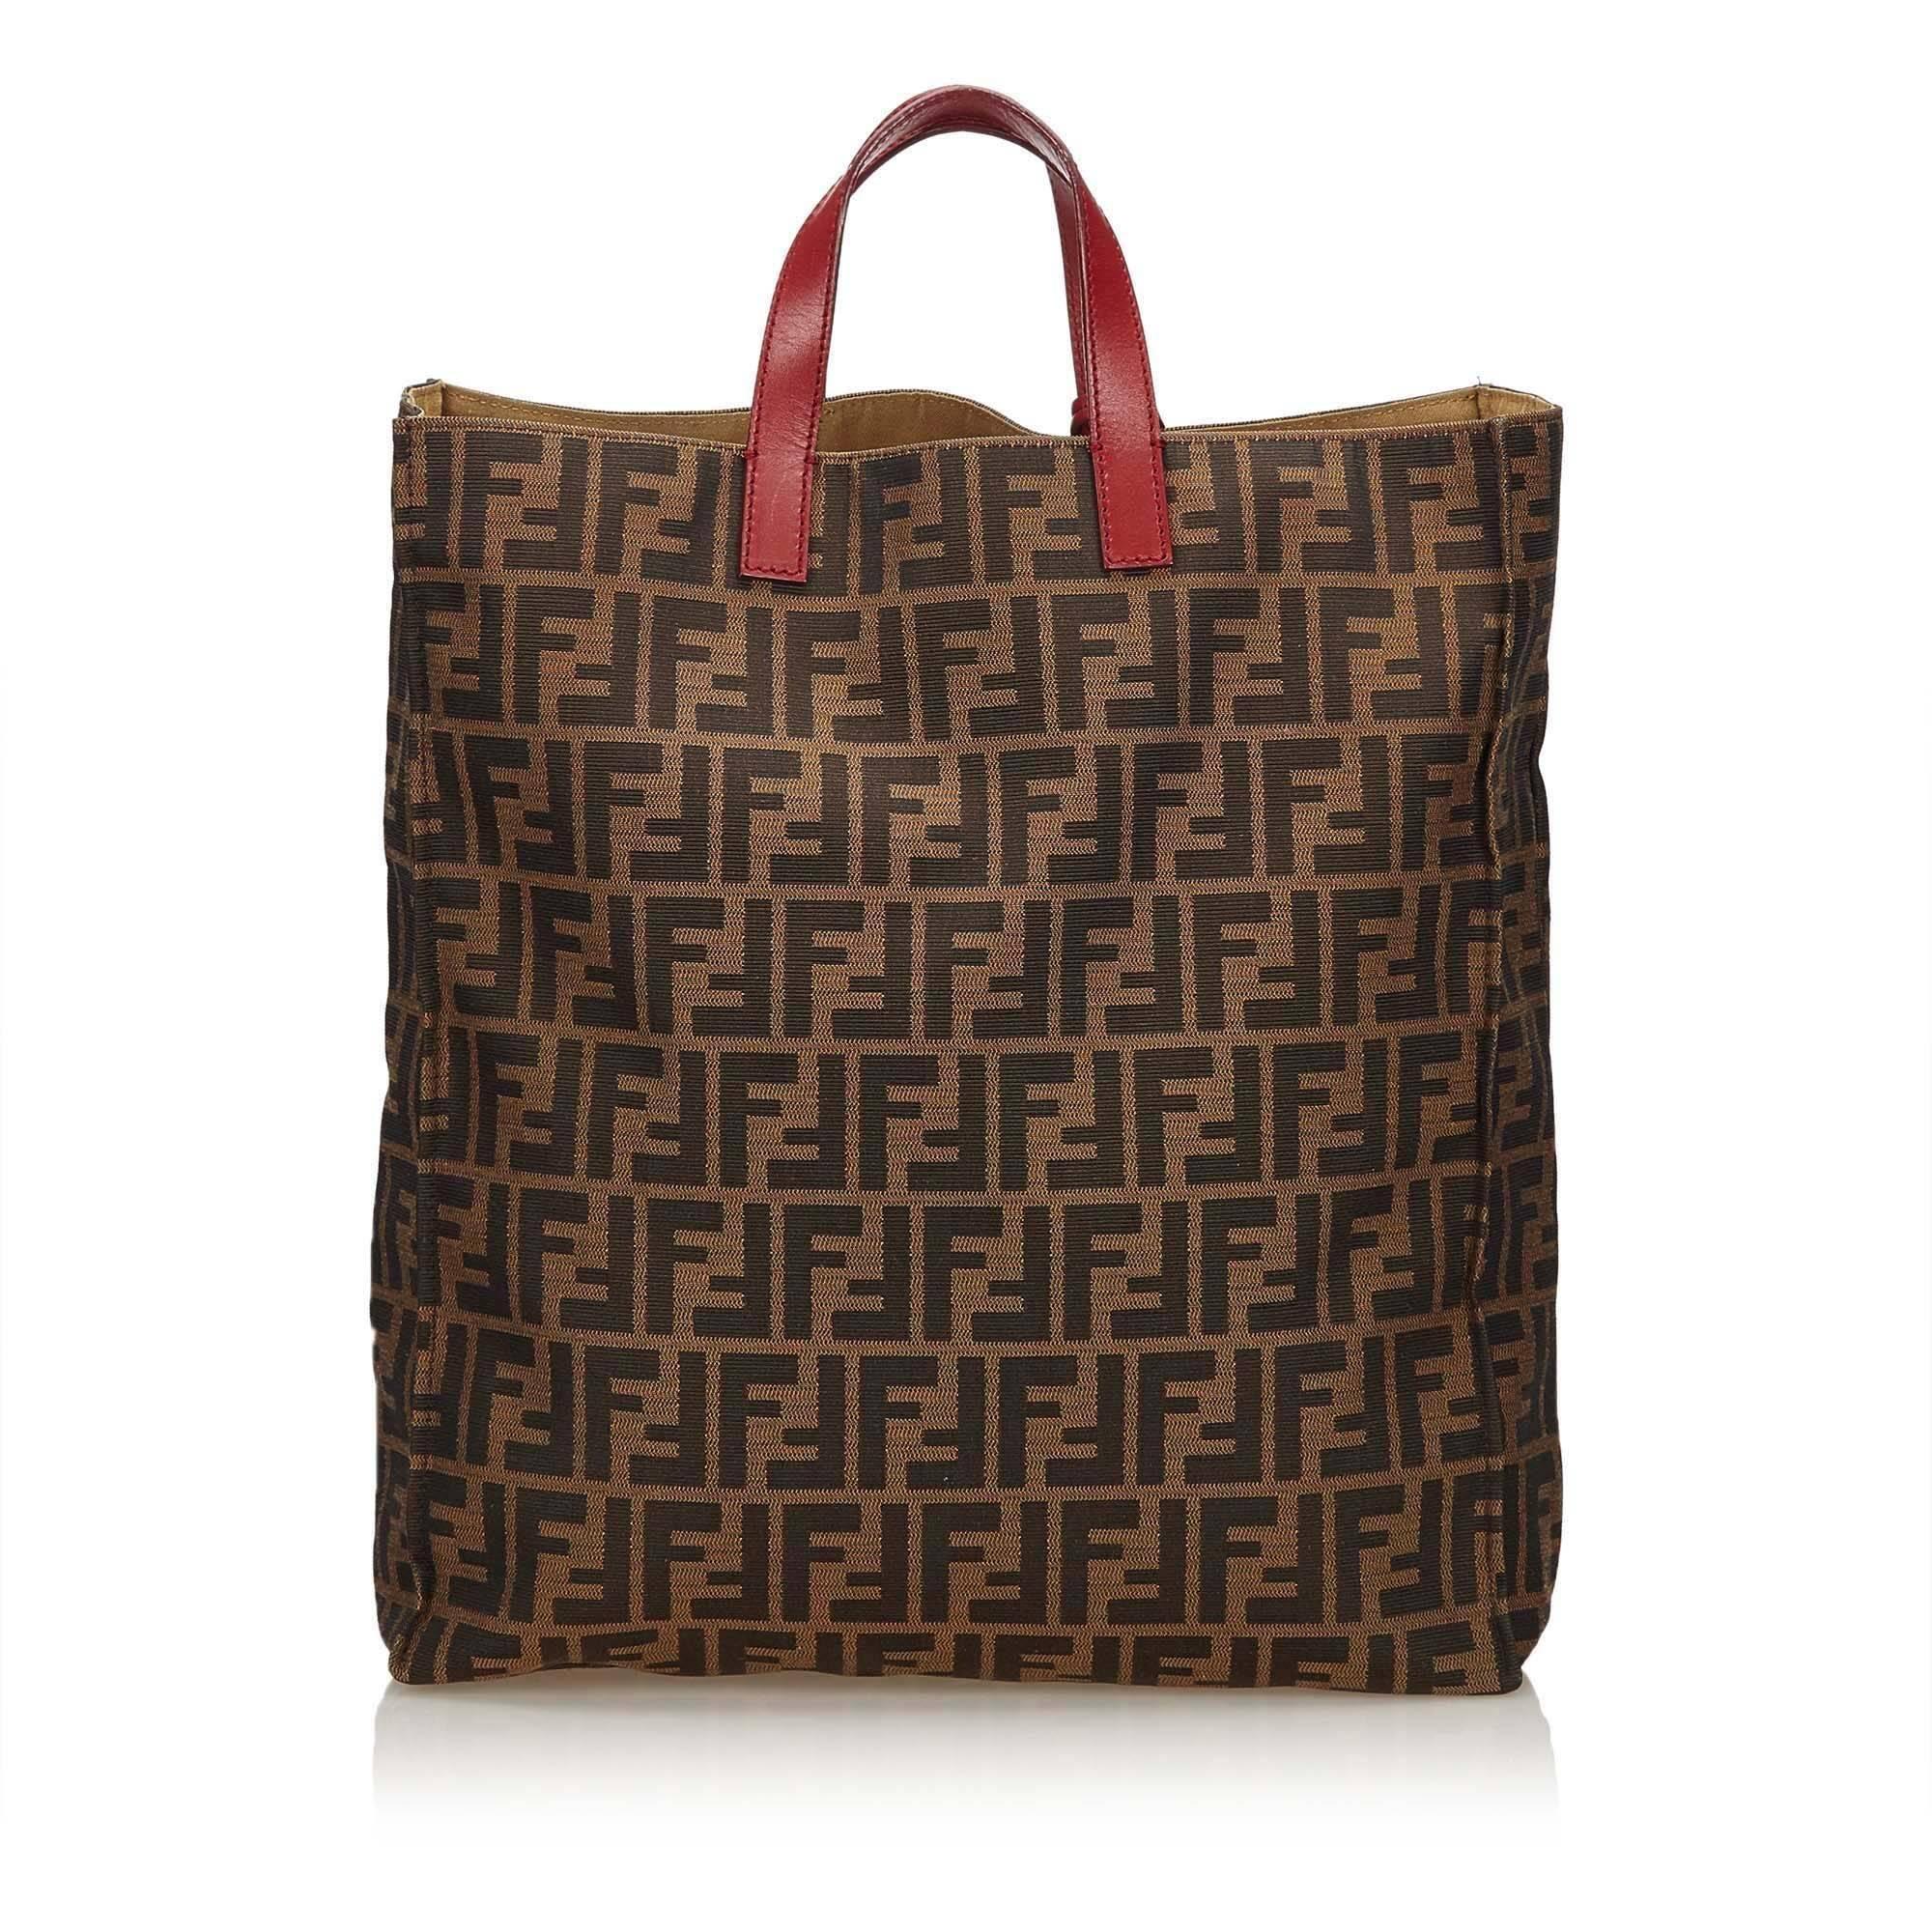 ... best price black fendi brown zucca shopper tote bag for sale b9630  a2495 ... fe313950bbe27